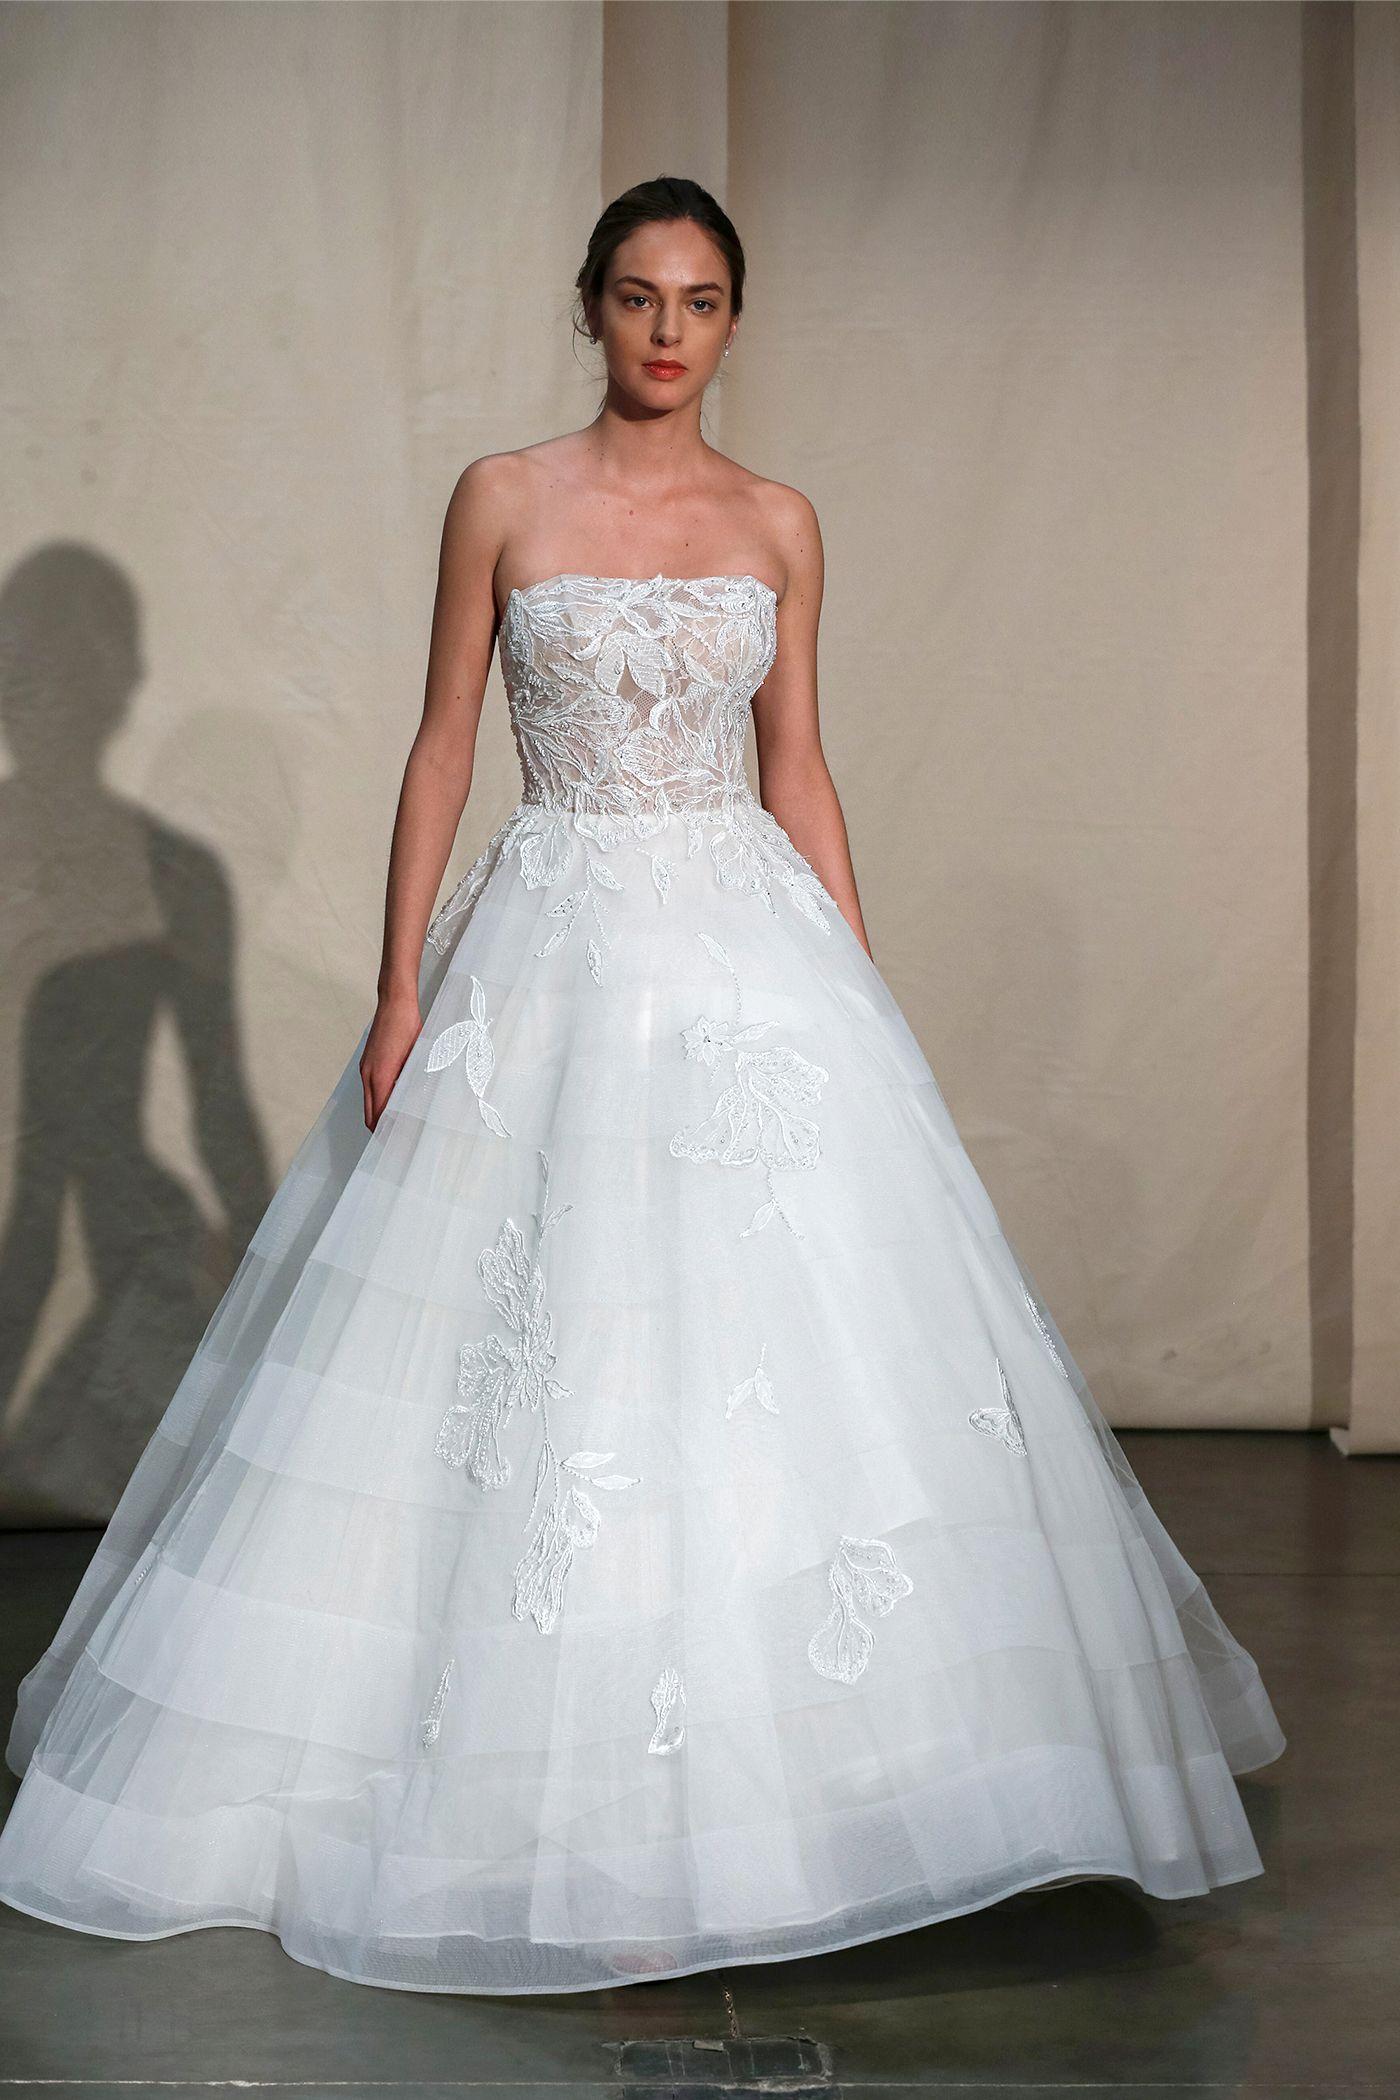 Justin Alexander Spring 2020 Wedding Dress Collection With Images Wedding Dress Styles Wedding Dresses Cocktail Dress Wedding,Printable Wedding Dress Template